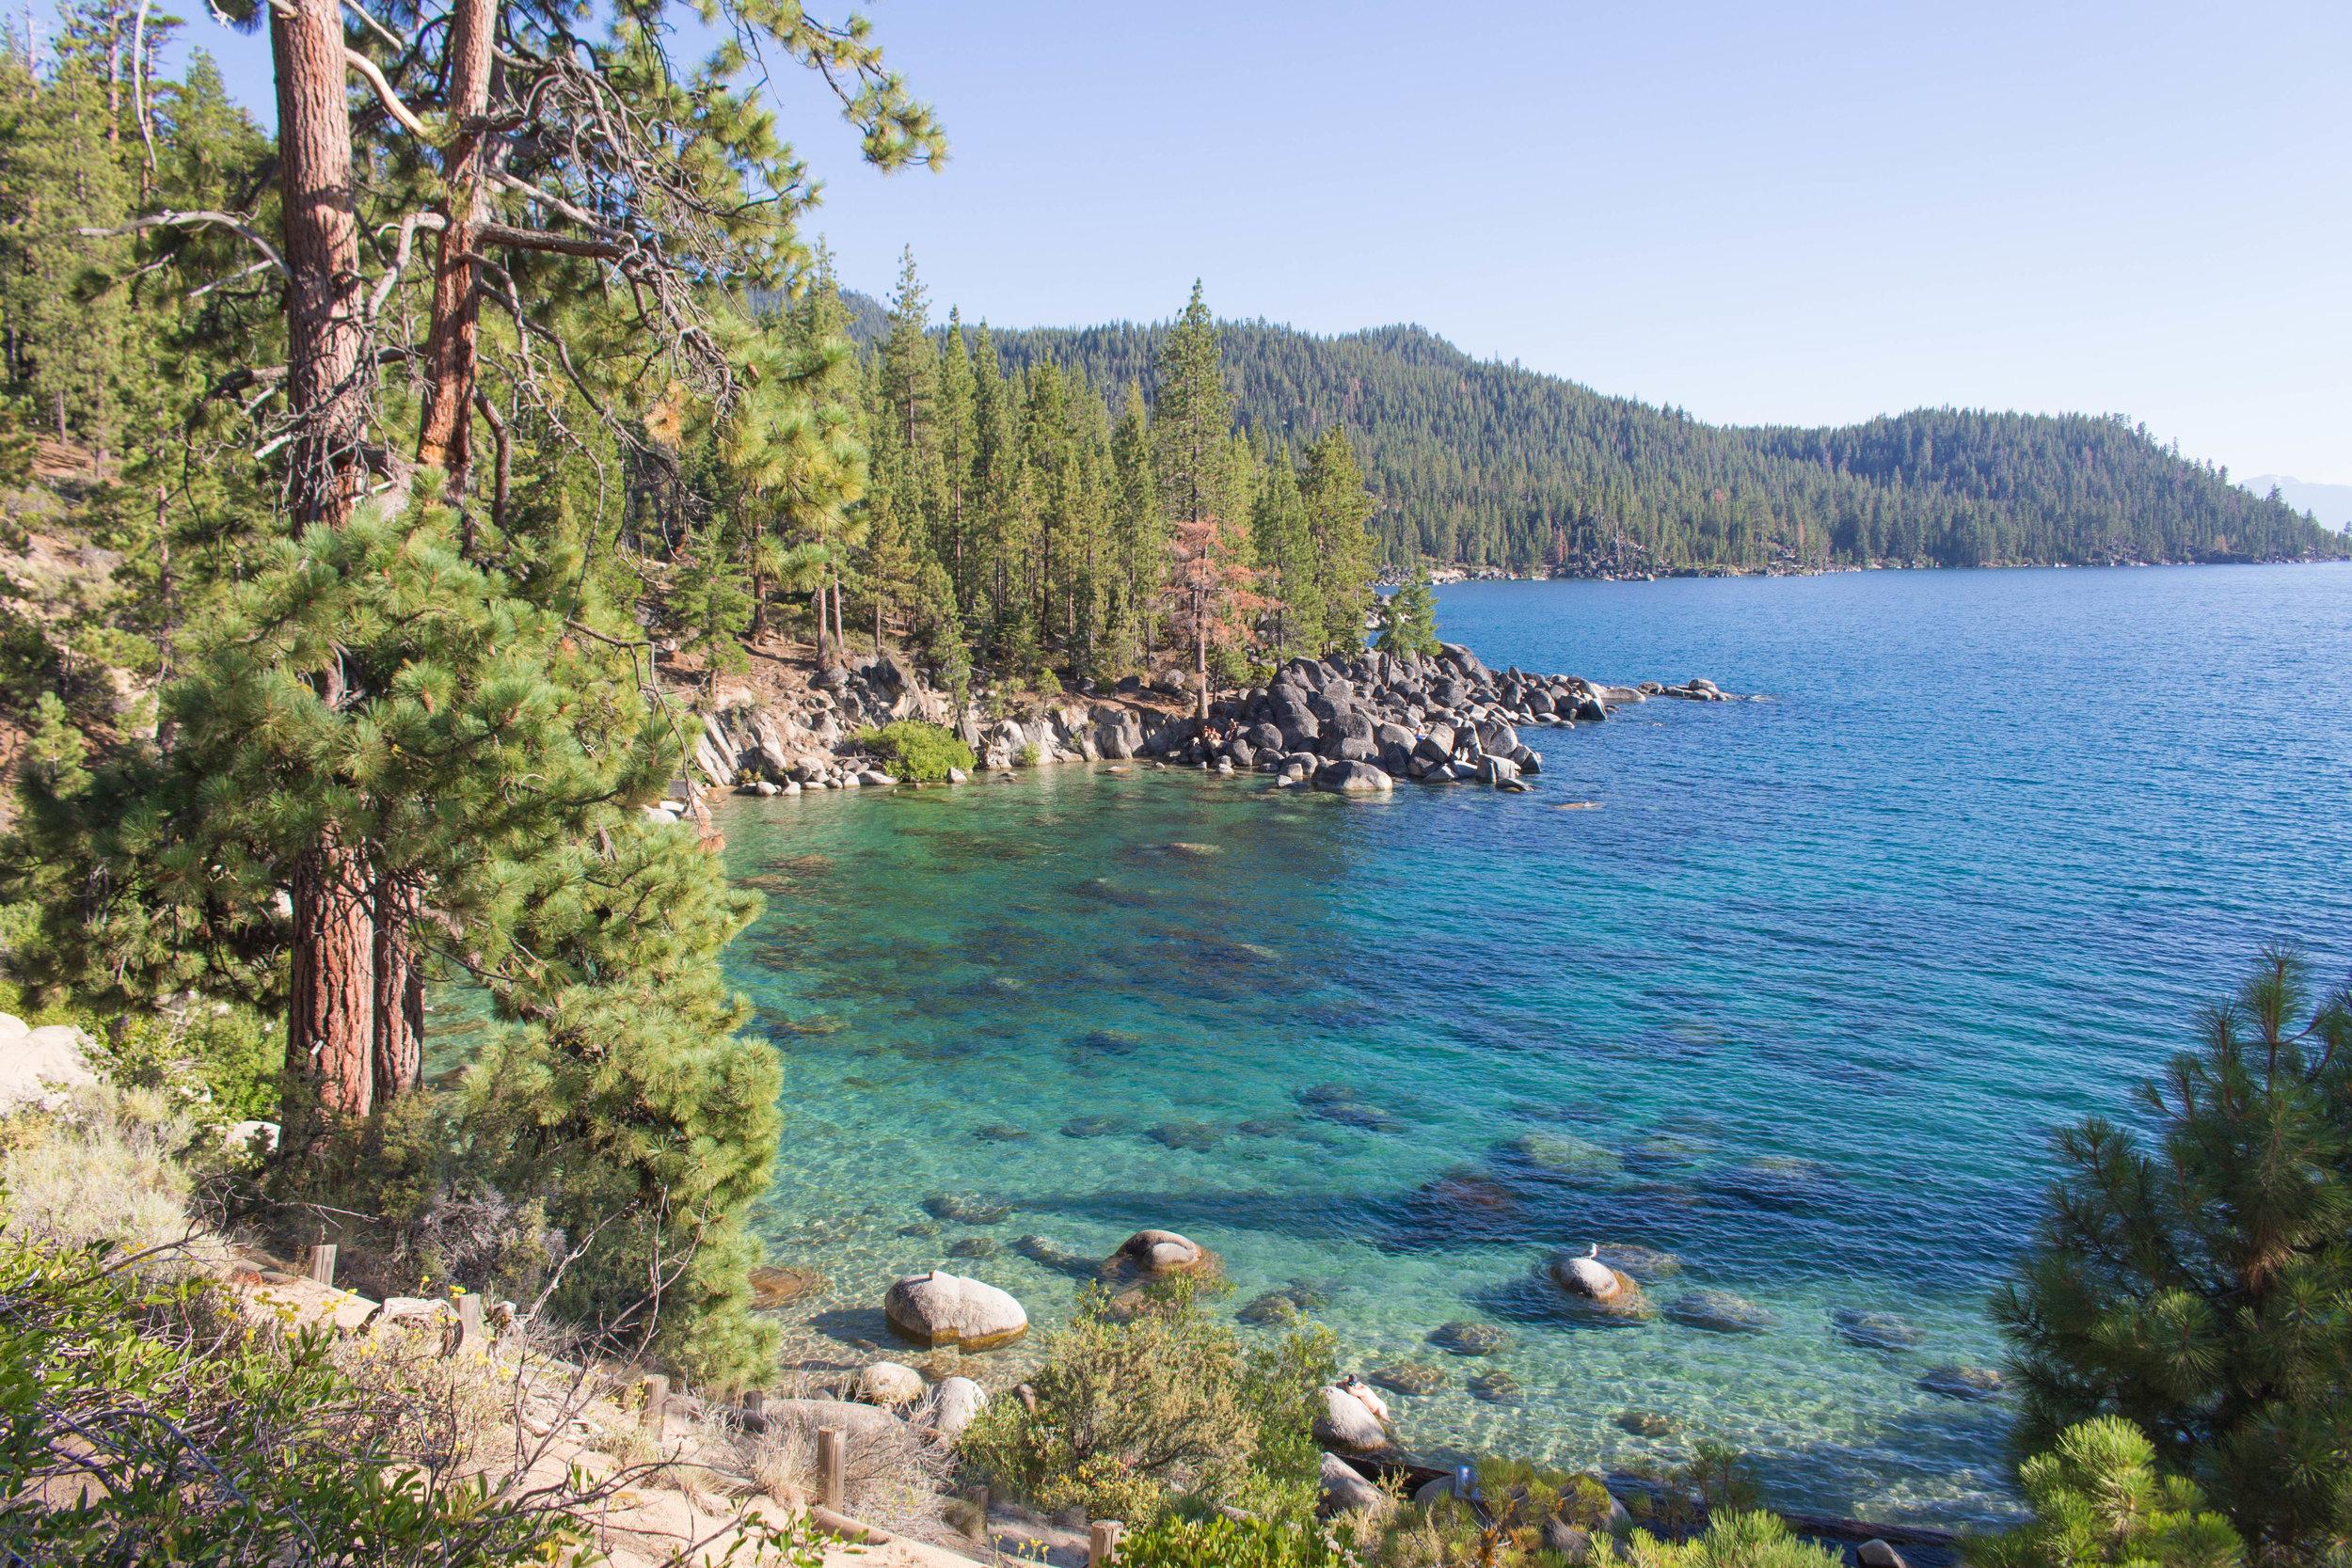 secret SUMMER TRAVEL GUIDE TO SOUTH LAKE TAhoe - secret cove